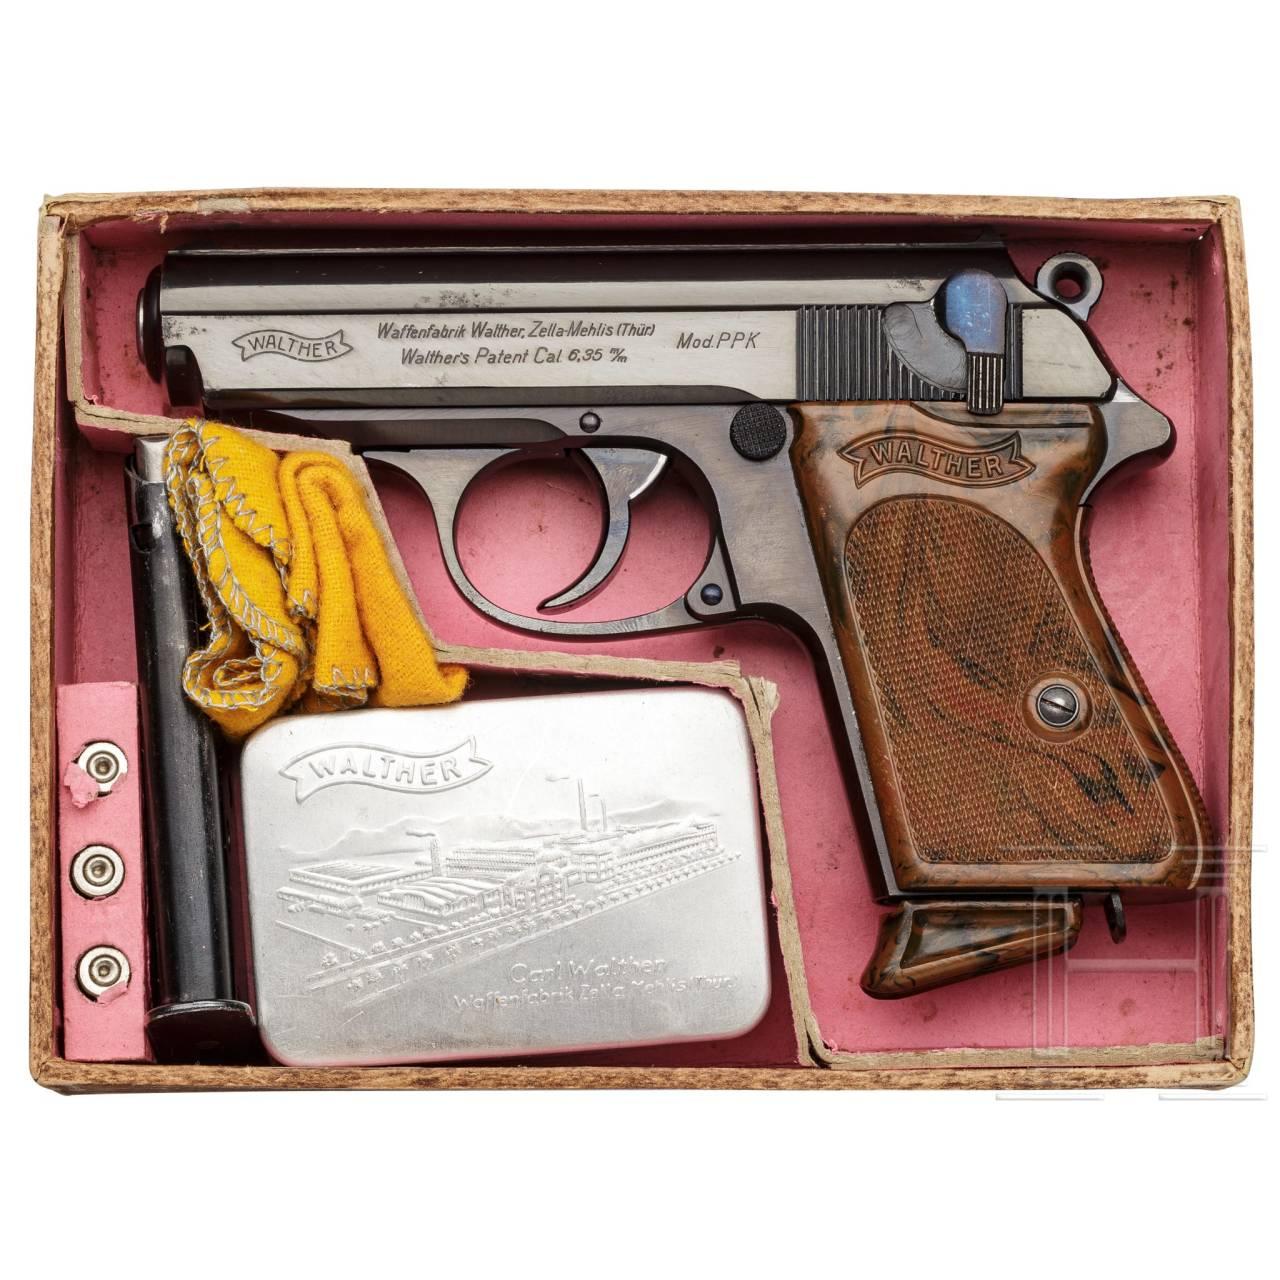 A Walther PPK, ZM, in original cardboard box